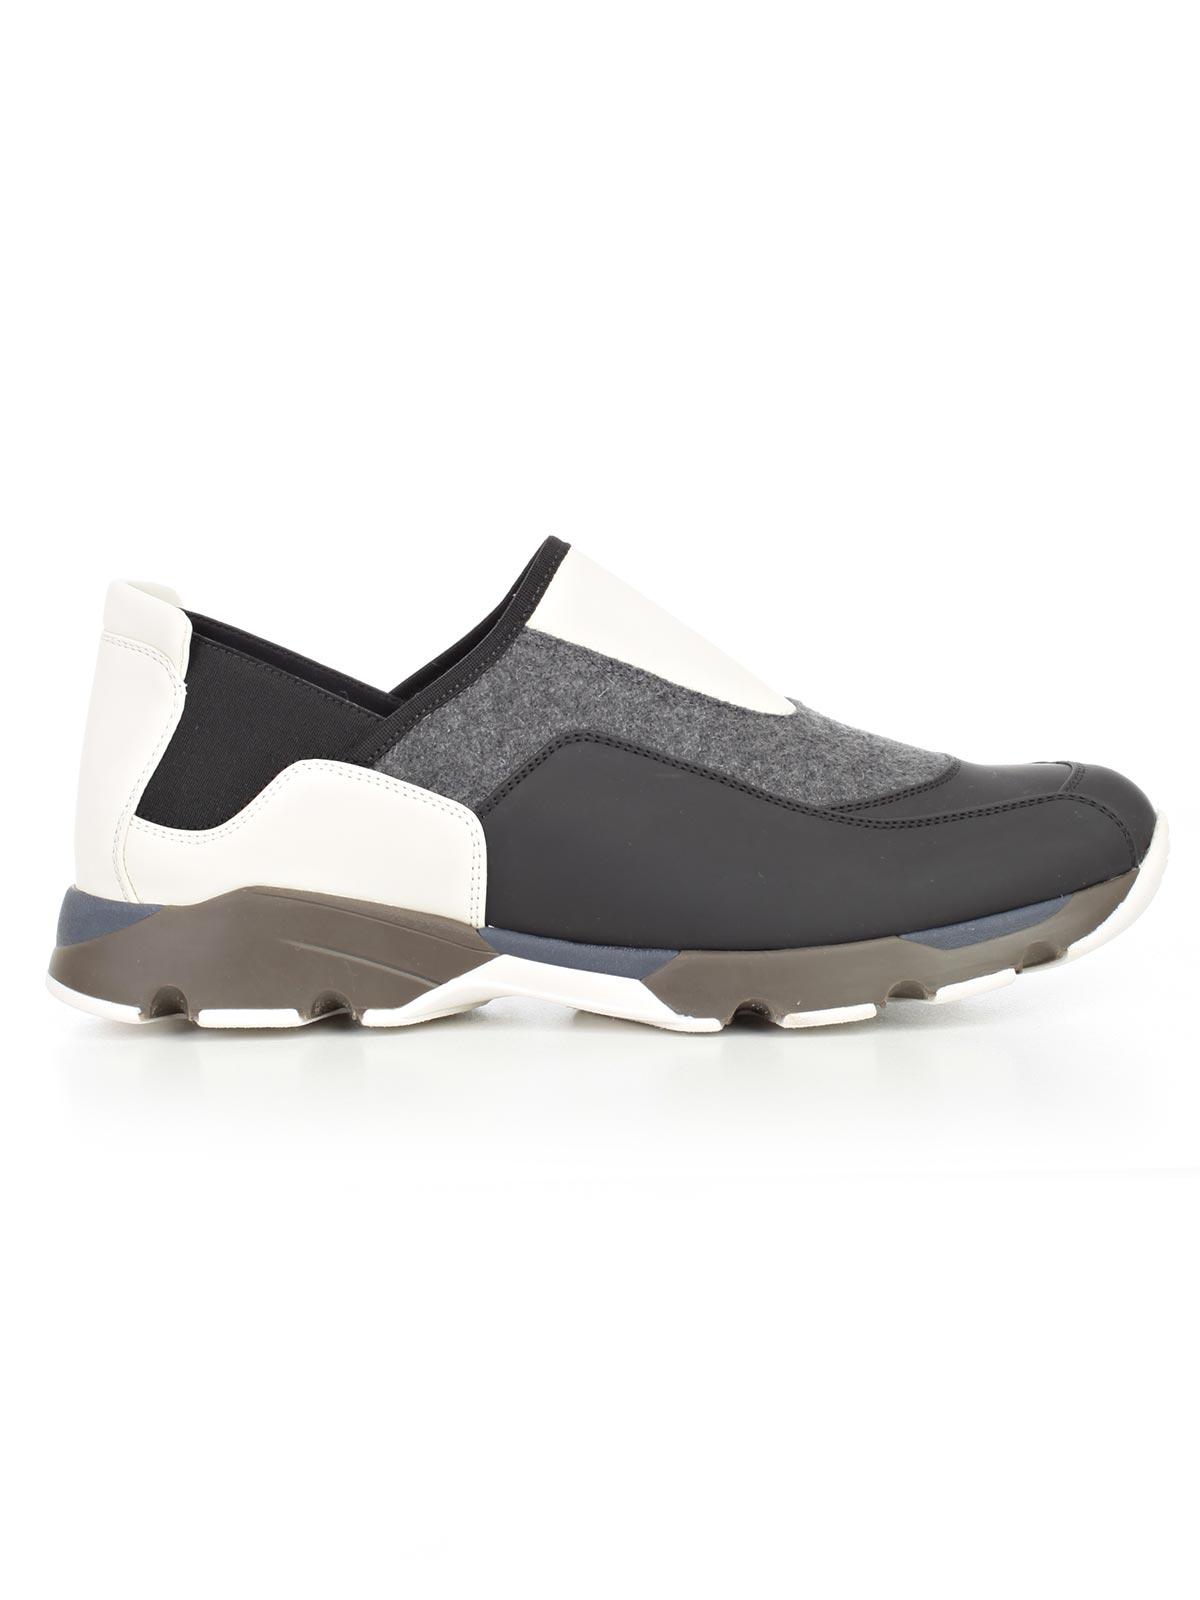 Picture of MARNI FOOTWEAR SCARPA SLIP ON